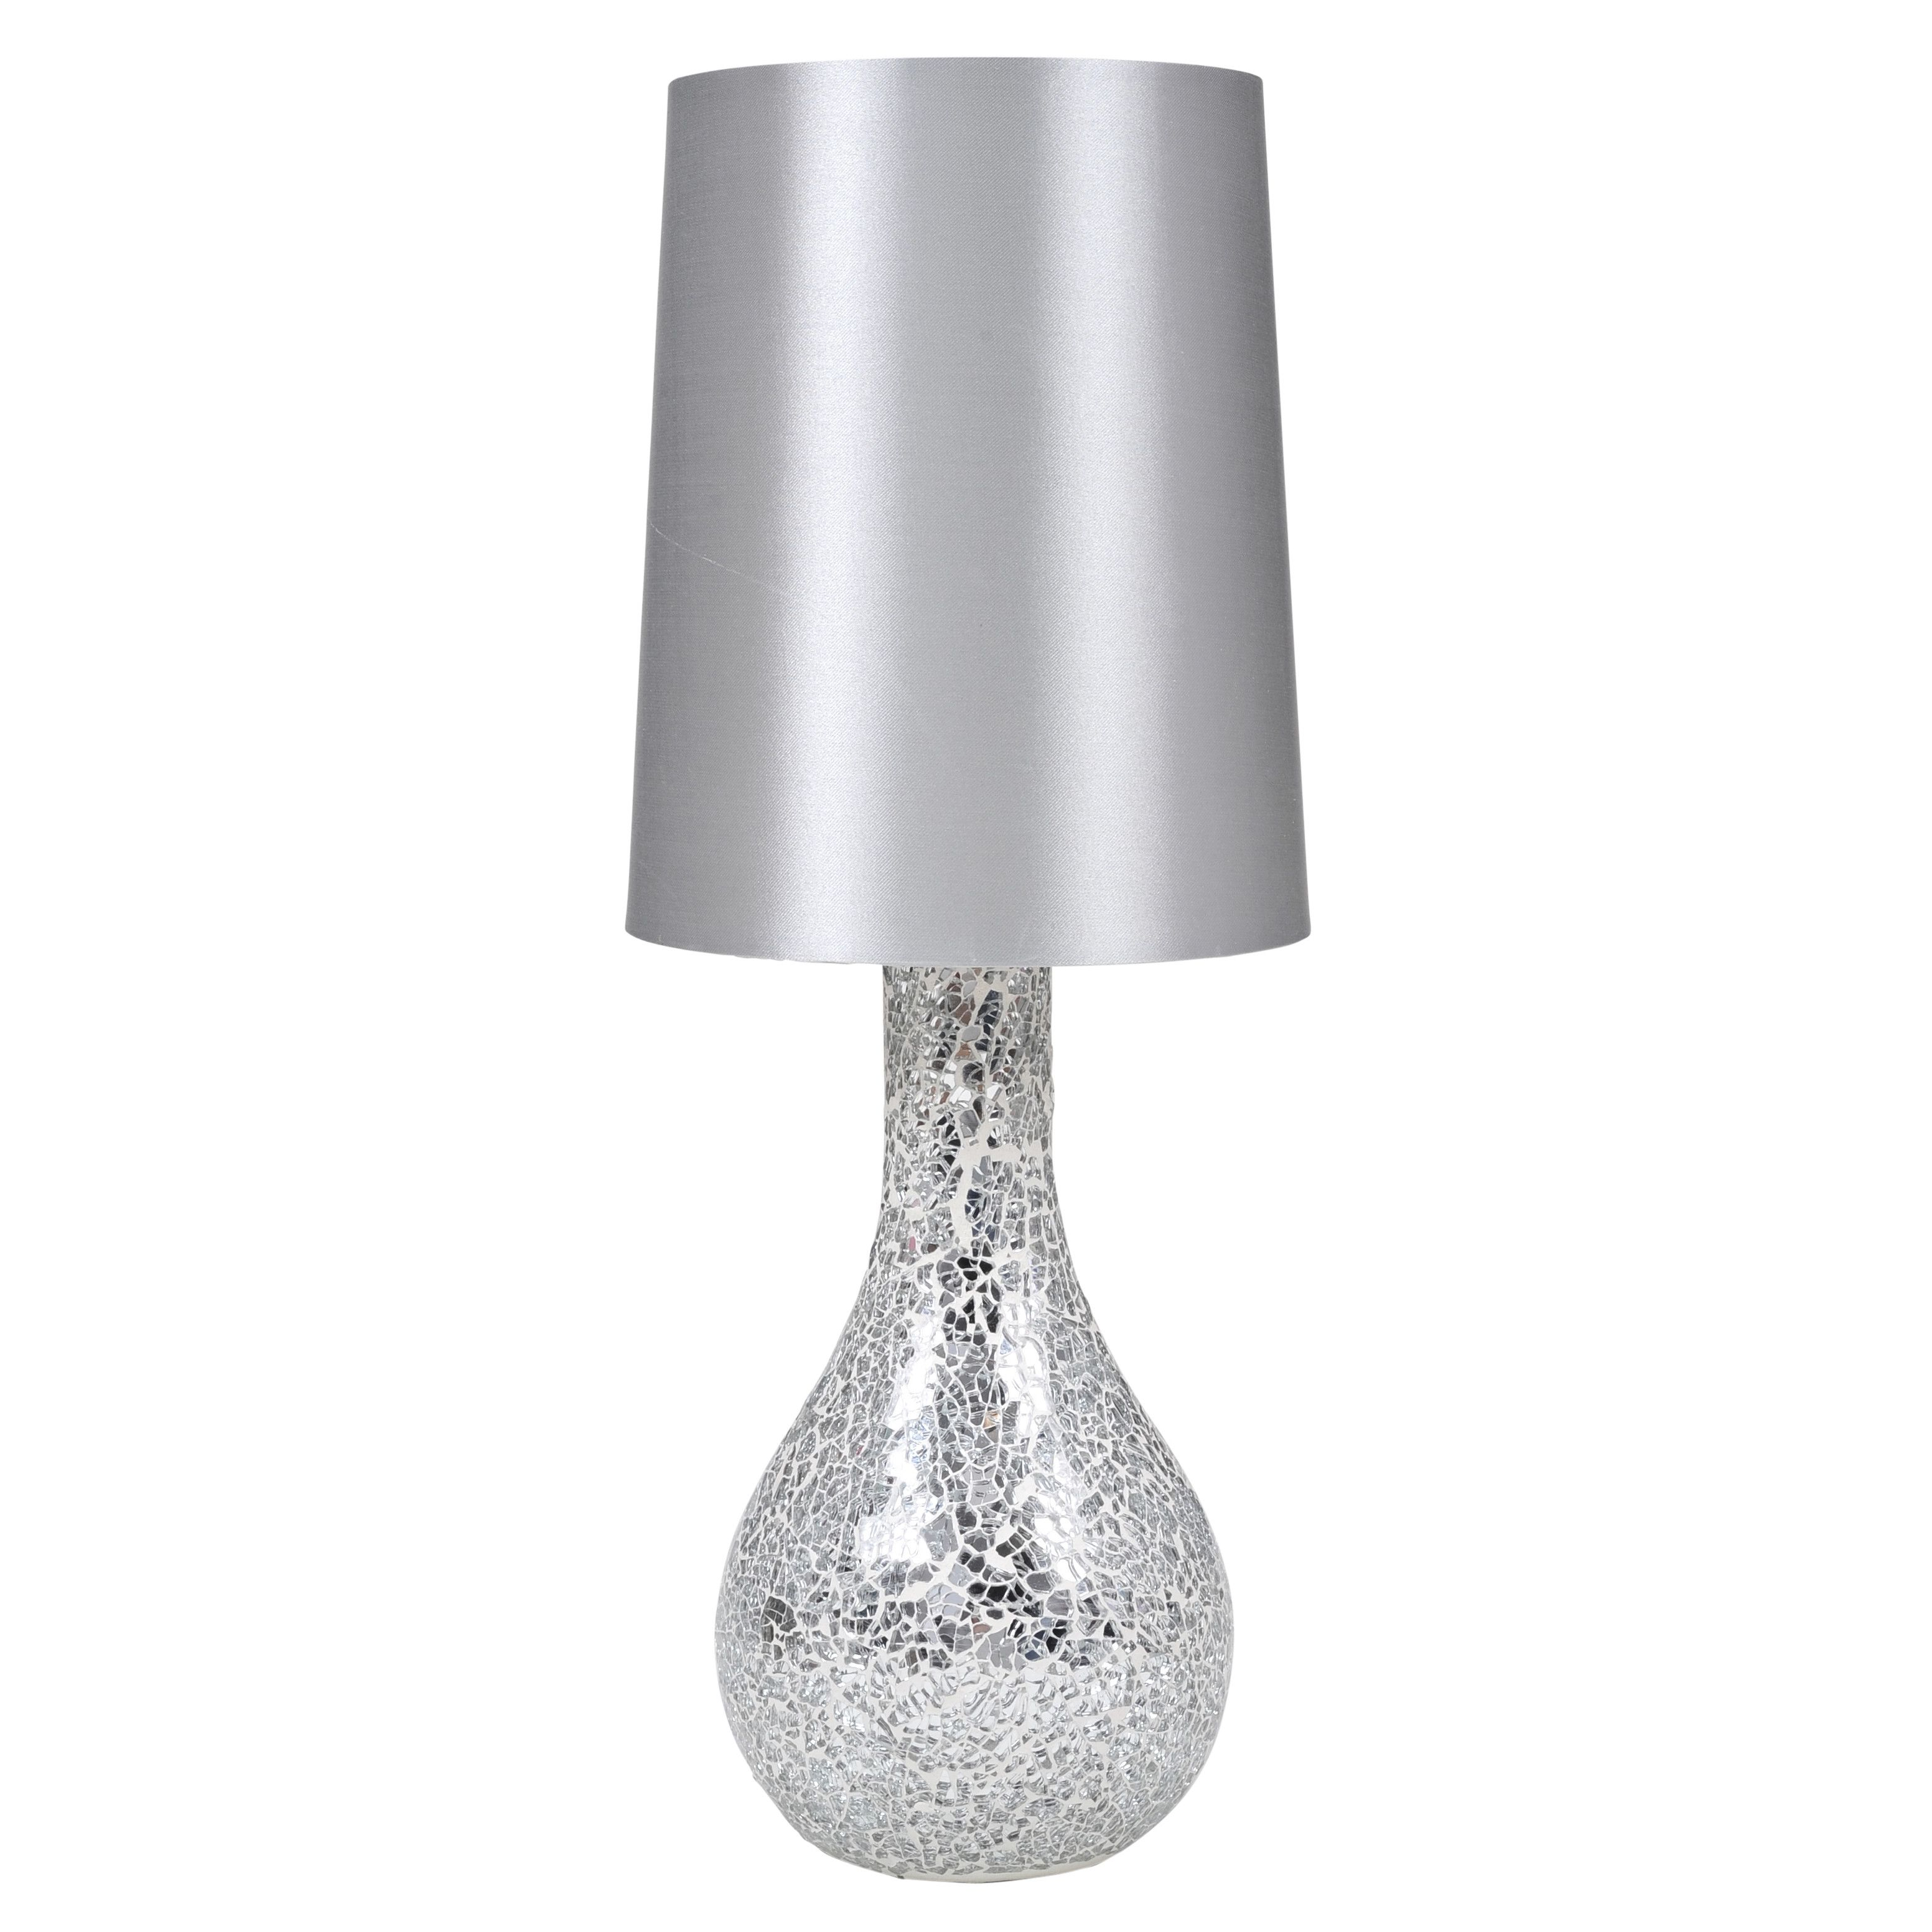 "Urban Shop Mosaic Glass 17"" Table Lamp & Reviews | Wayfair"